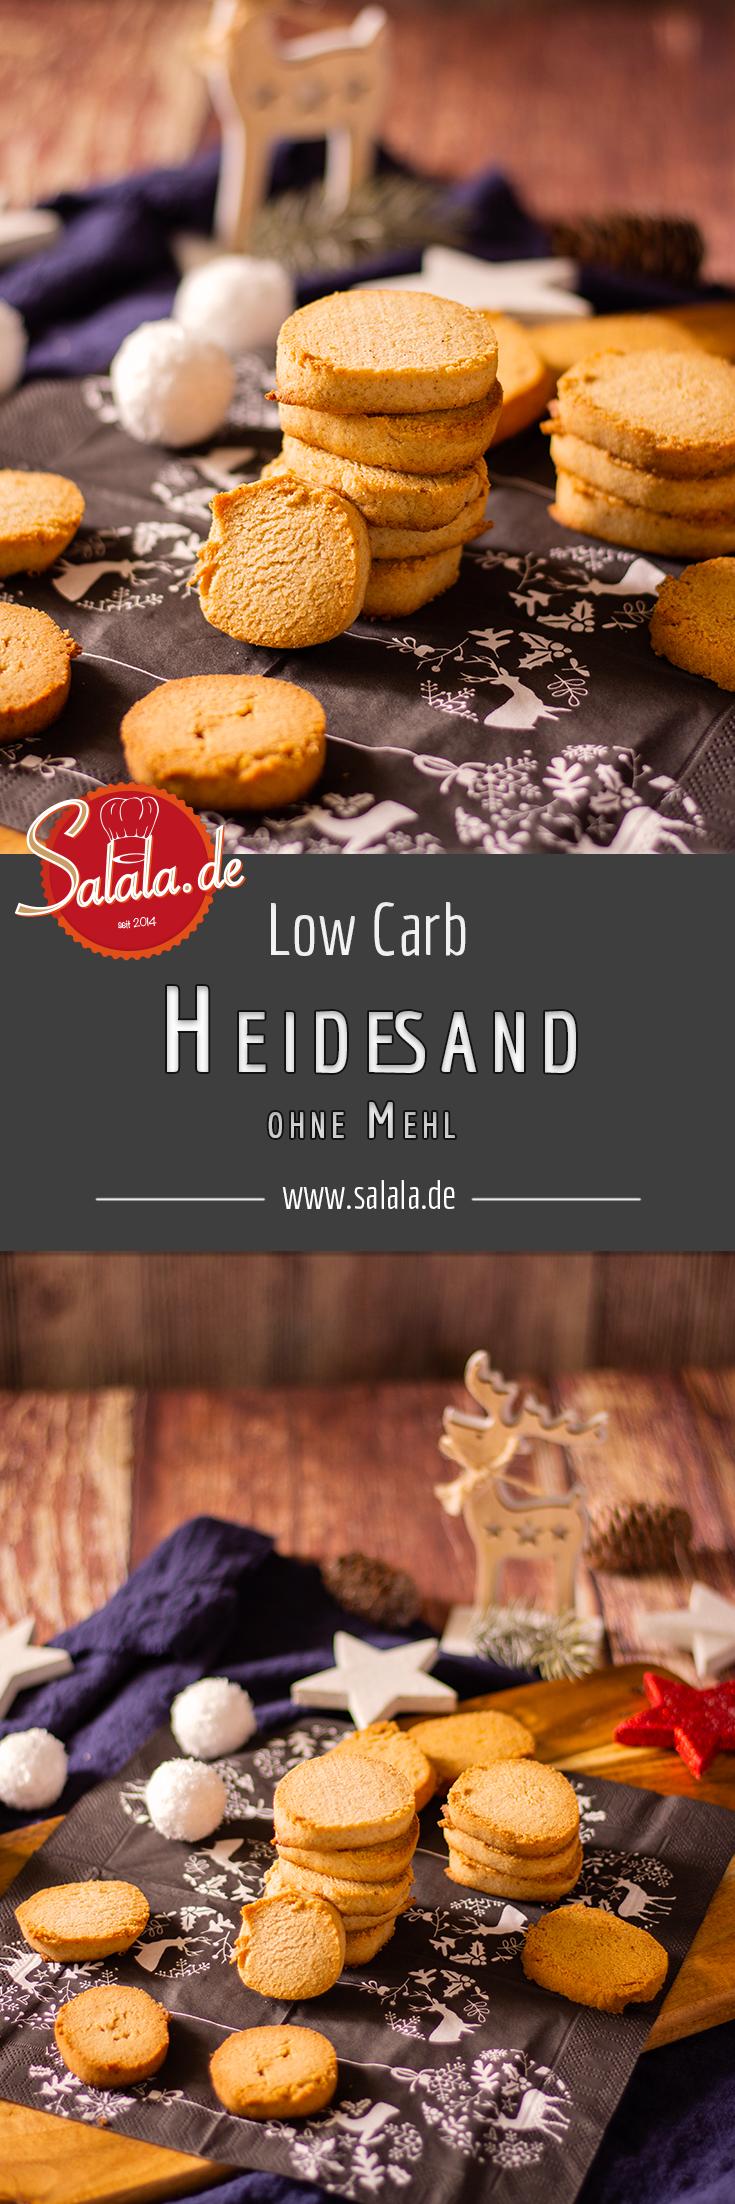 Low Carb Heidesand